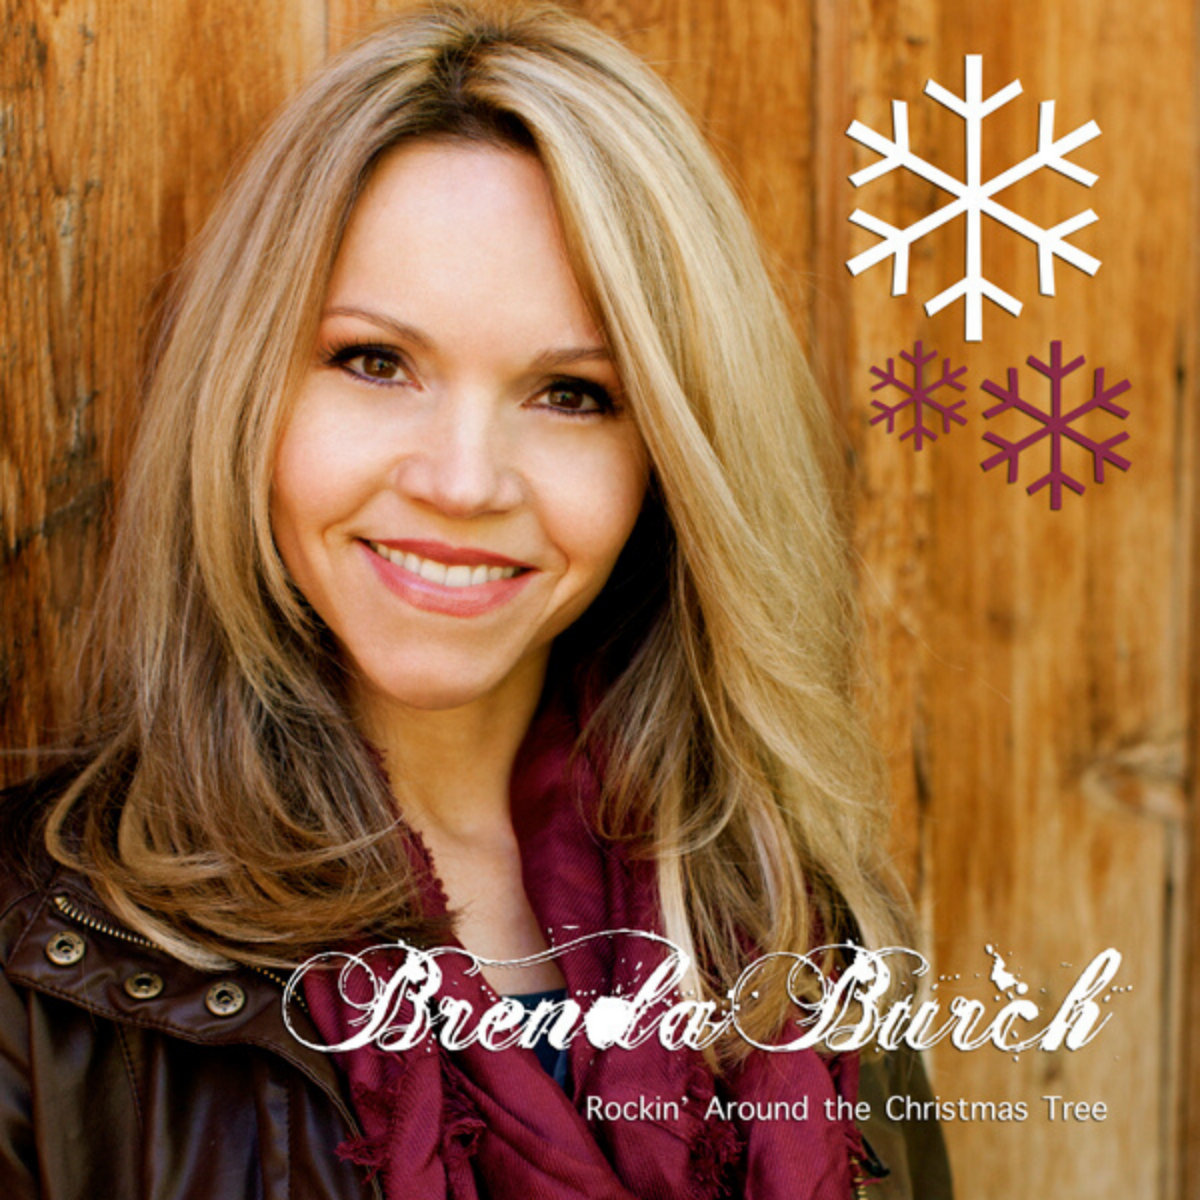 Rockin' Around the Christmas Tree by Brenda Burch